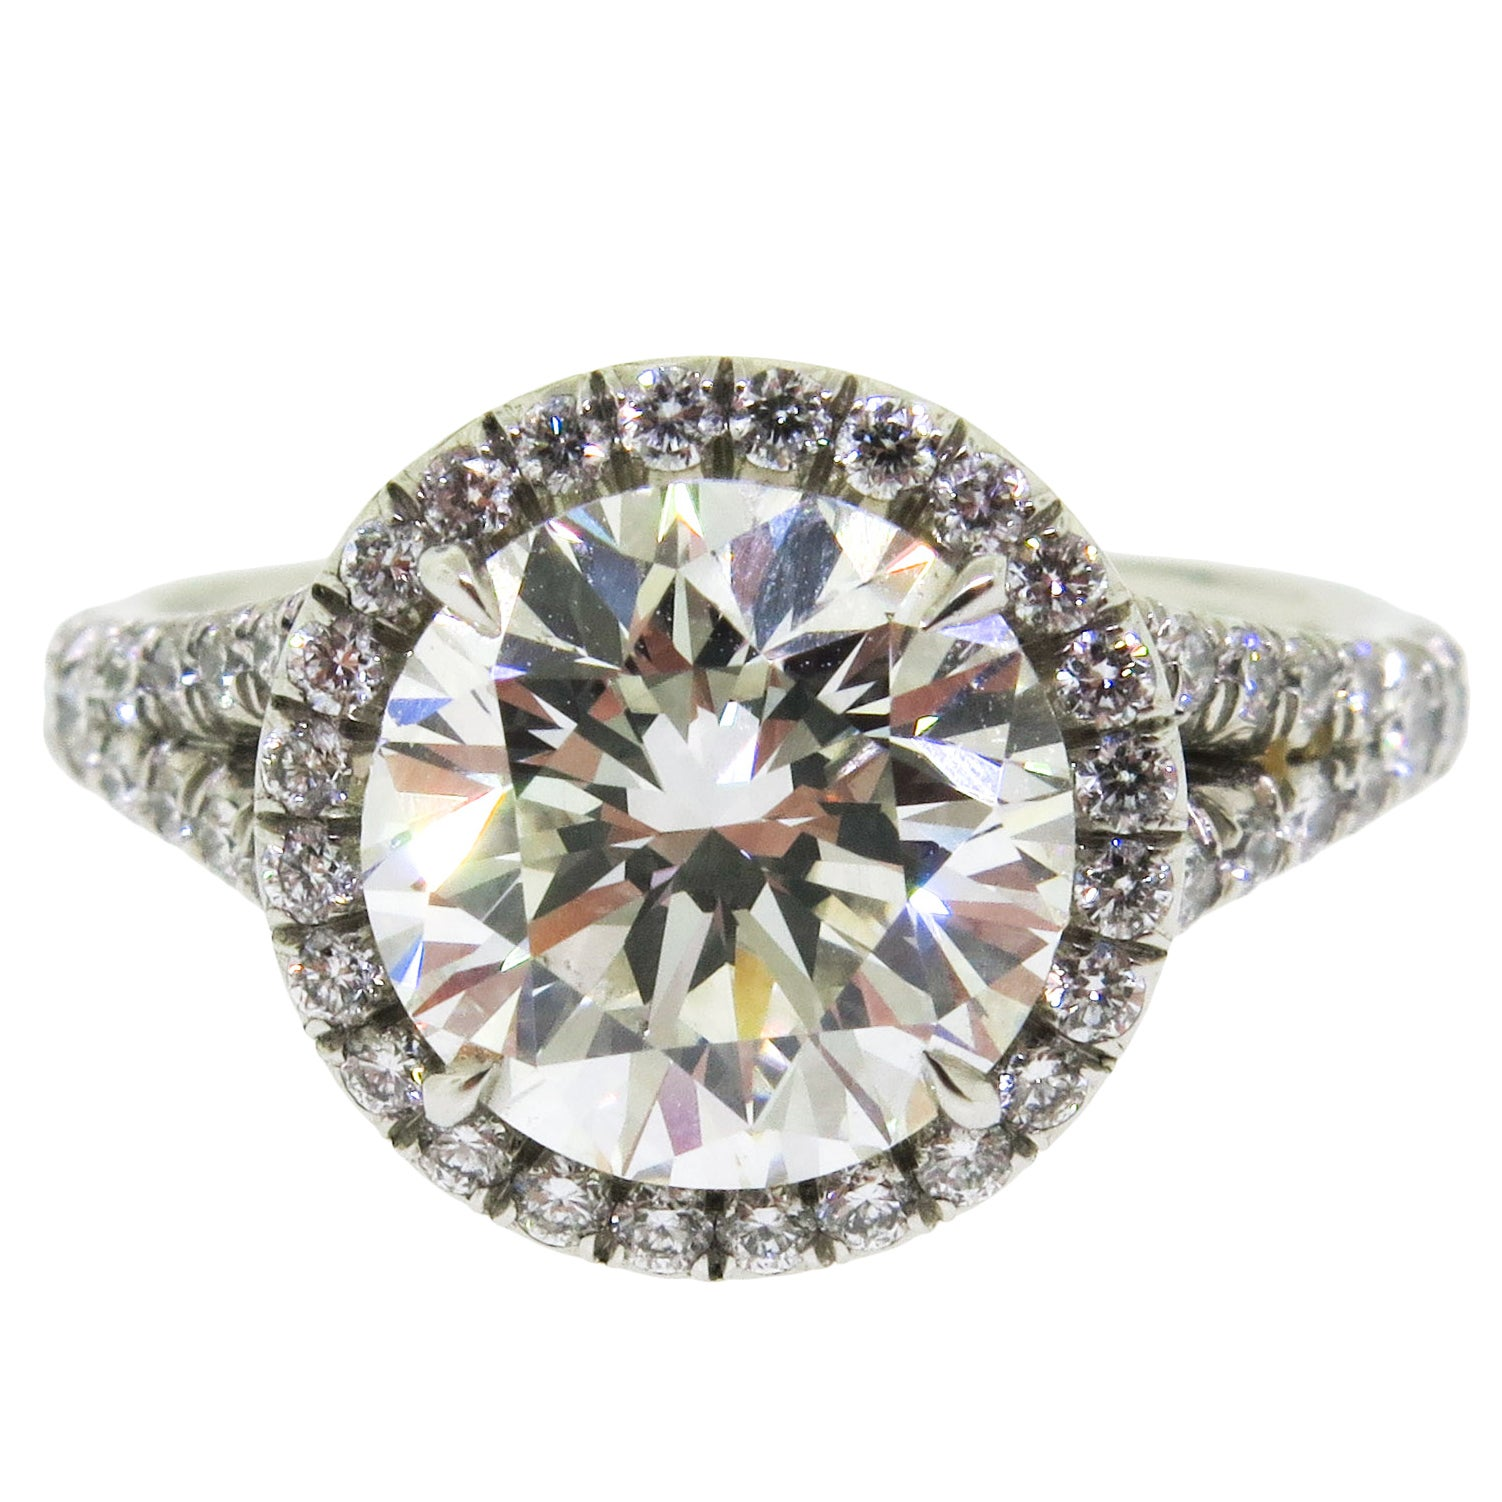 GIA Certified 3.01 ct. Round Diamond Platinum Halo Engagement Ring